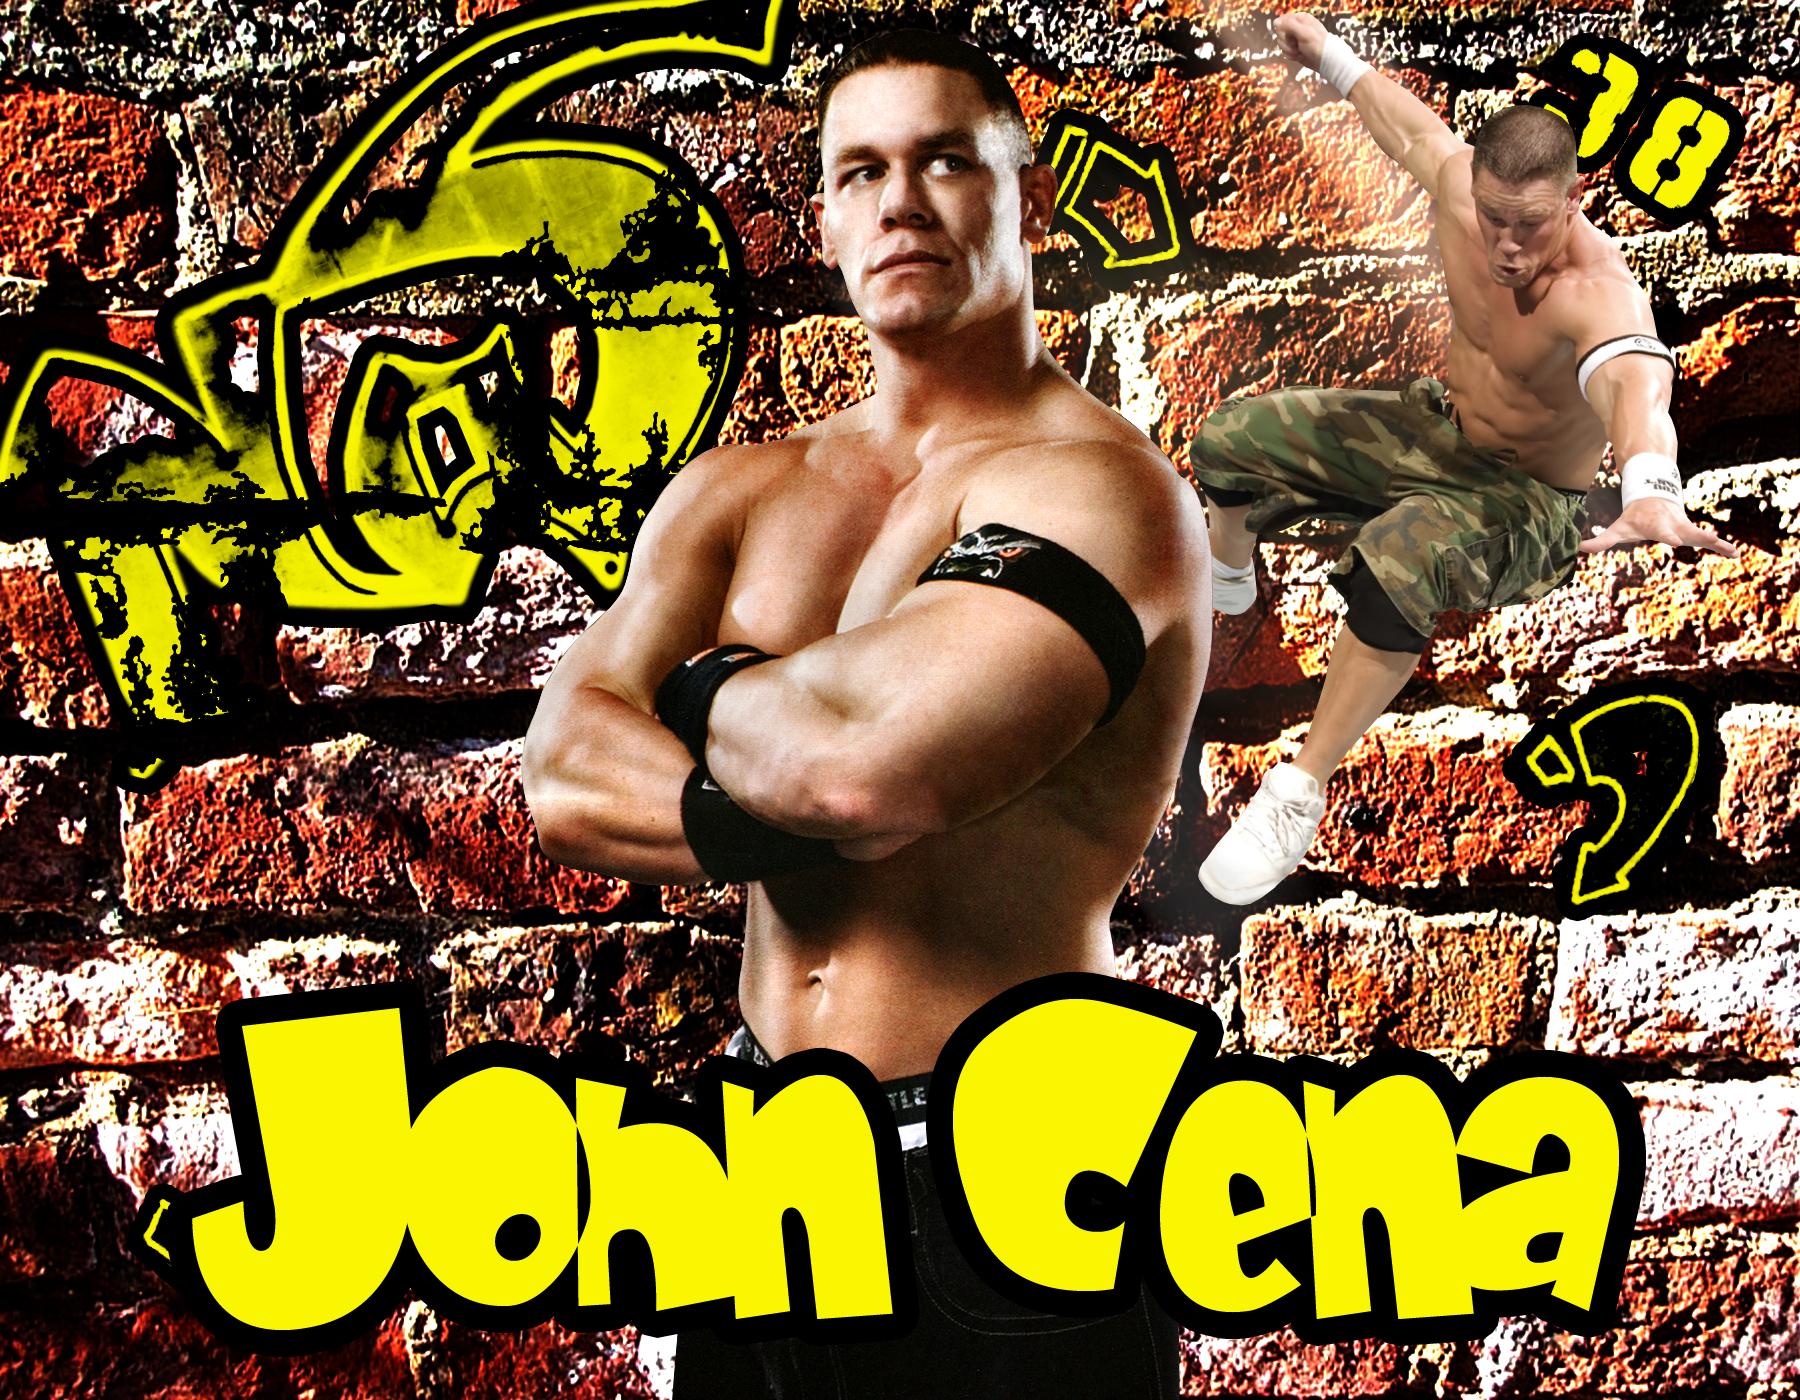 Wwe John Cena Wallpaper Www Deviantart More Like John Cena New Wwe